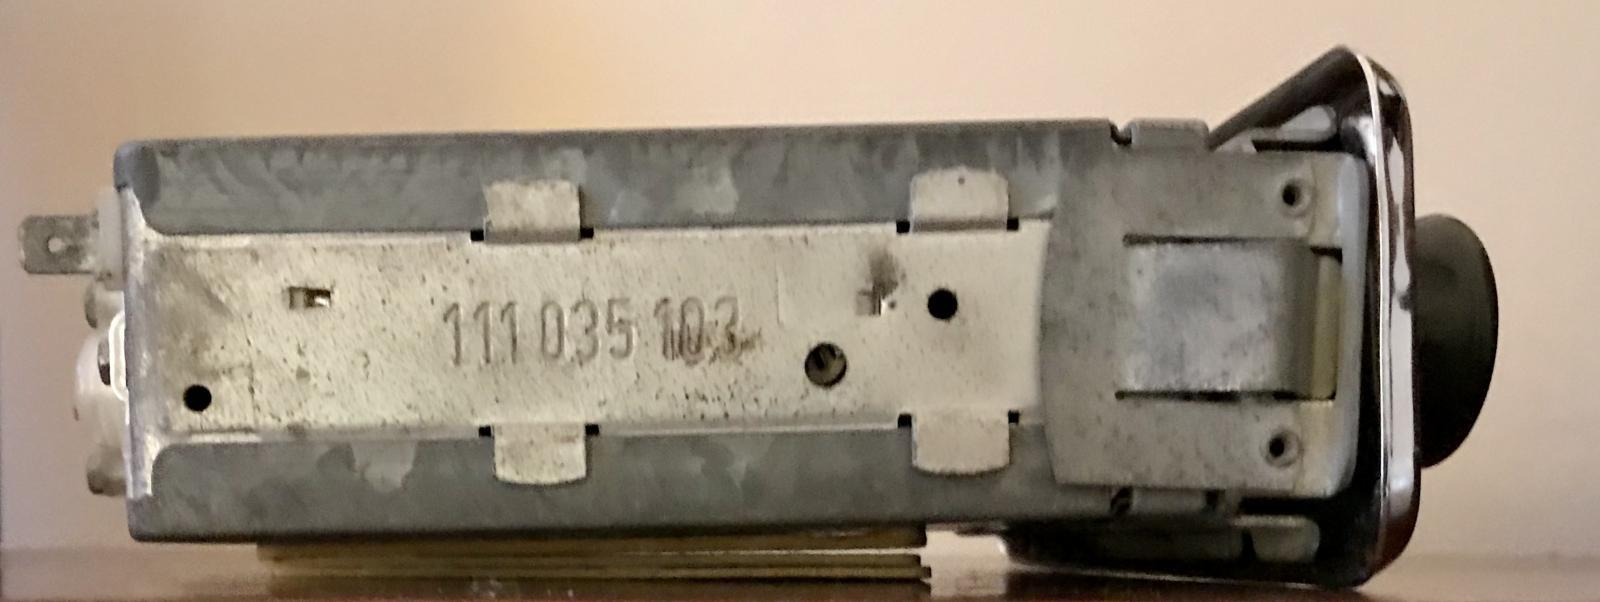 1967 Emden 111 035 103